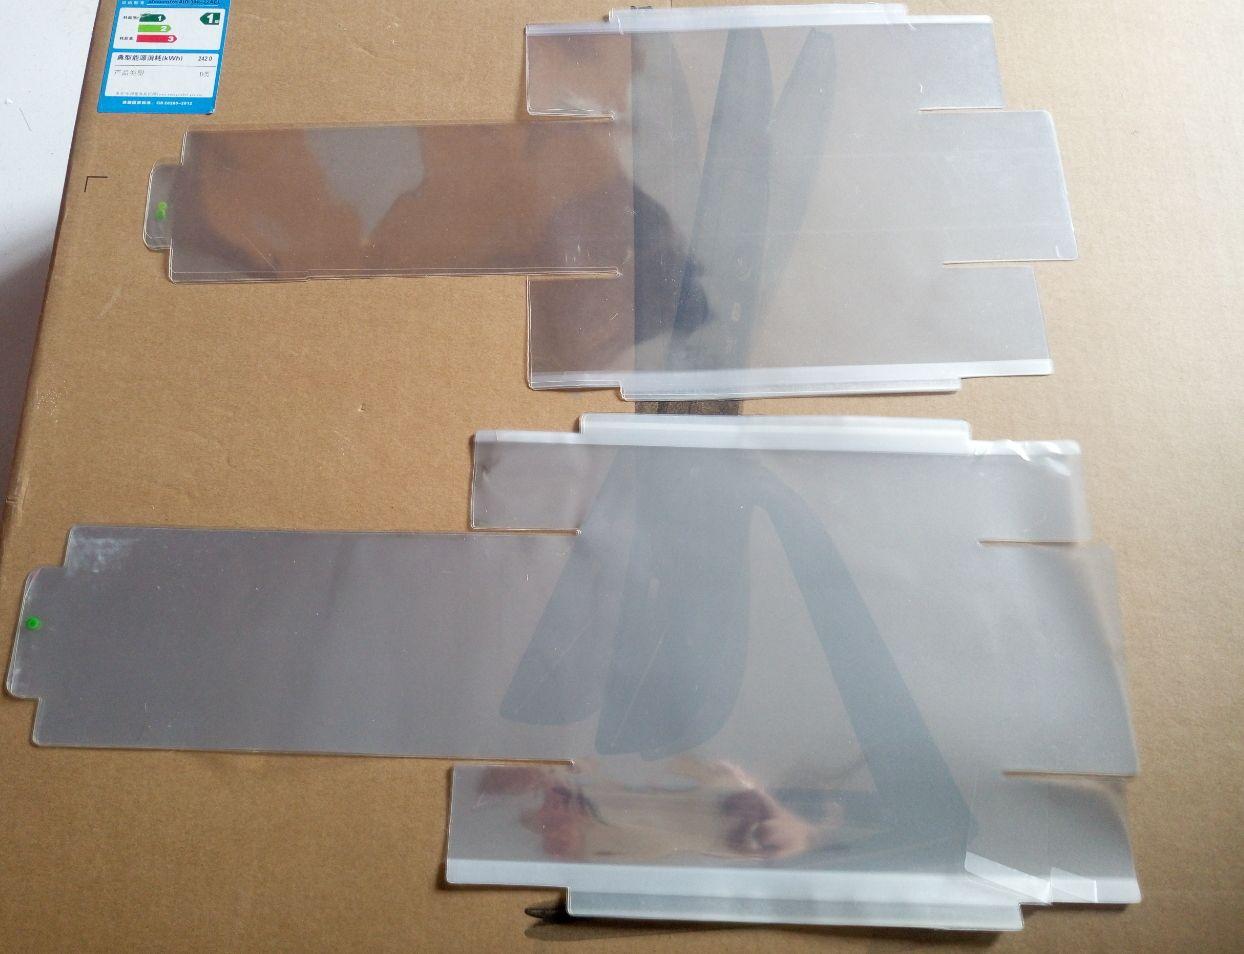 30pcs Wrap Sello de plástico película de plástico en el paquete de caja para iPhone 7 7G 8G 8 8P PLUS X XS MAX XR 11 PRO MAX 12 Pro max 12 mini